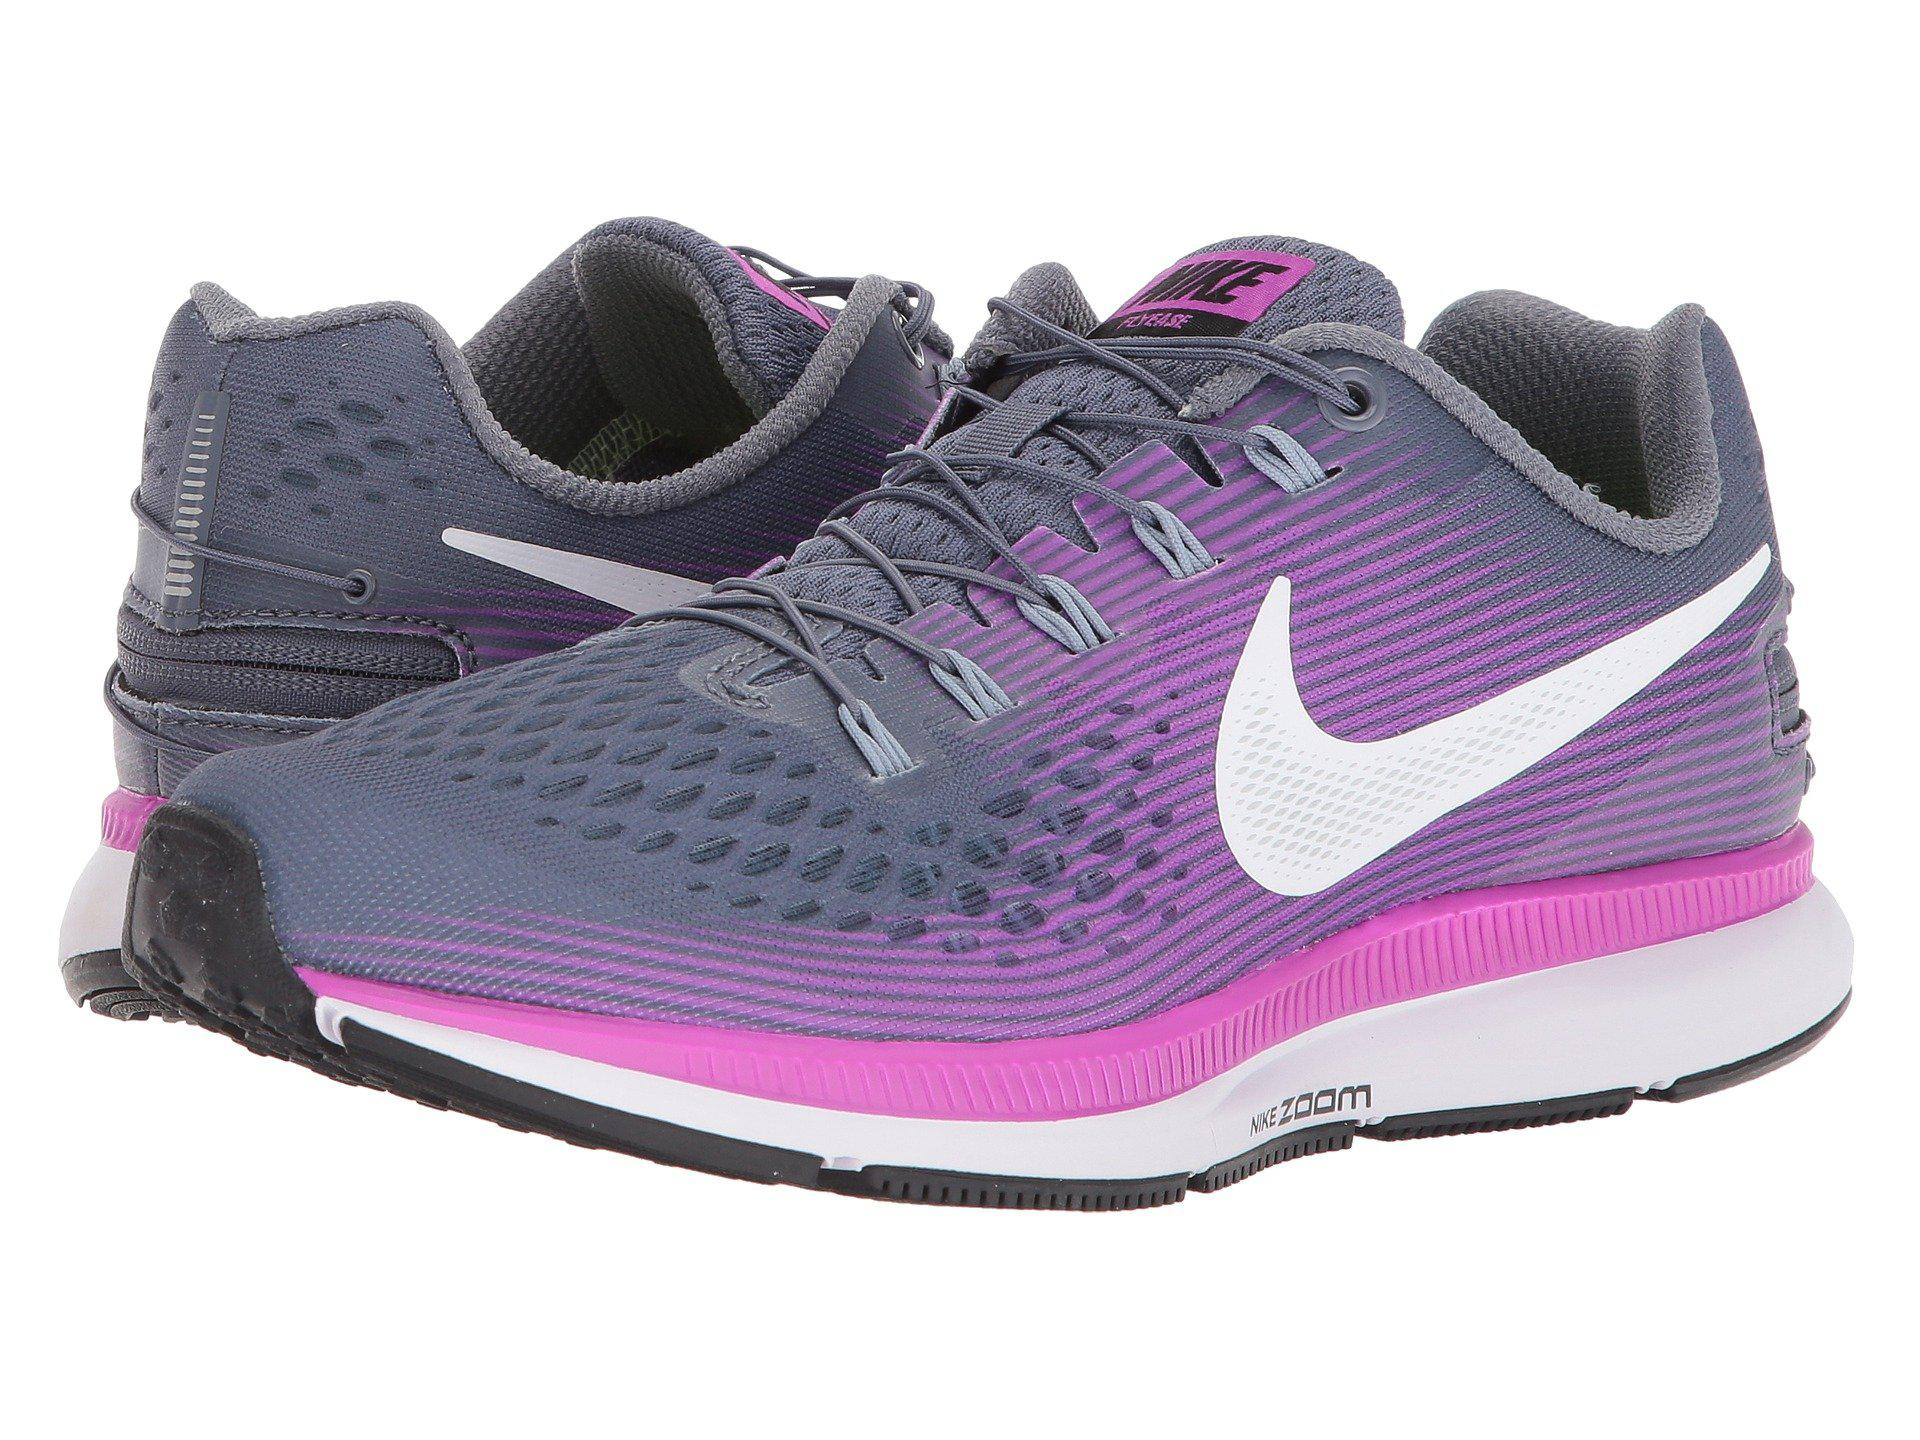 7237f14d4457fd ... running shoes green purple 6d00a c9fff  wholesale nike. womens purple air  zoom pegasus 34 flyease 8c7f5 18e9e